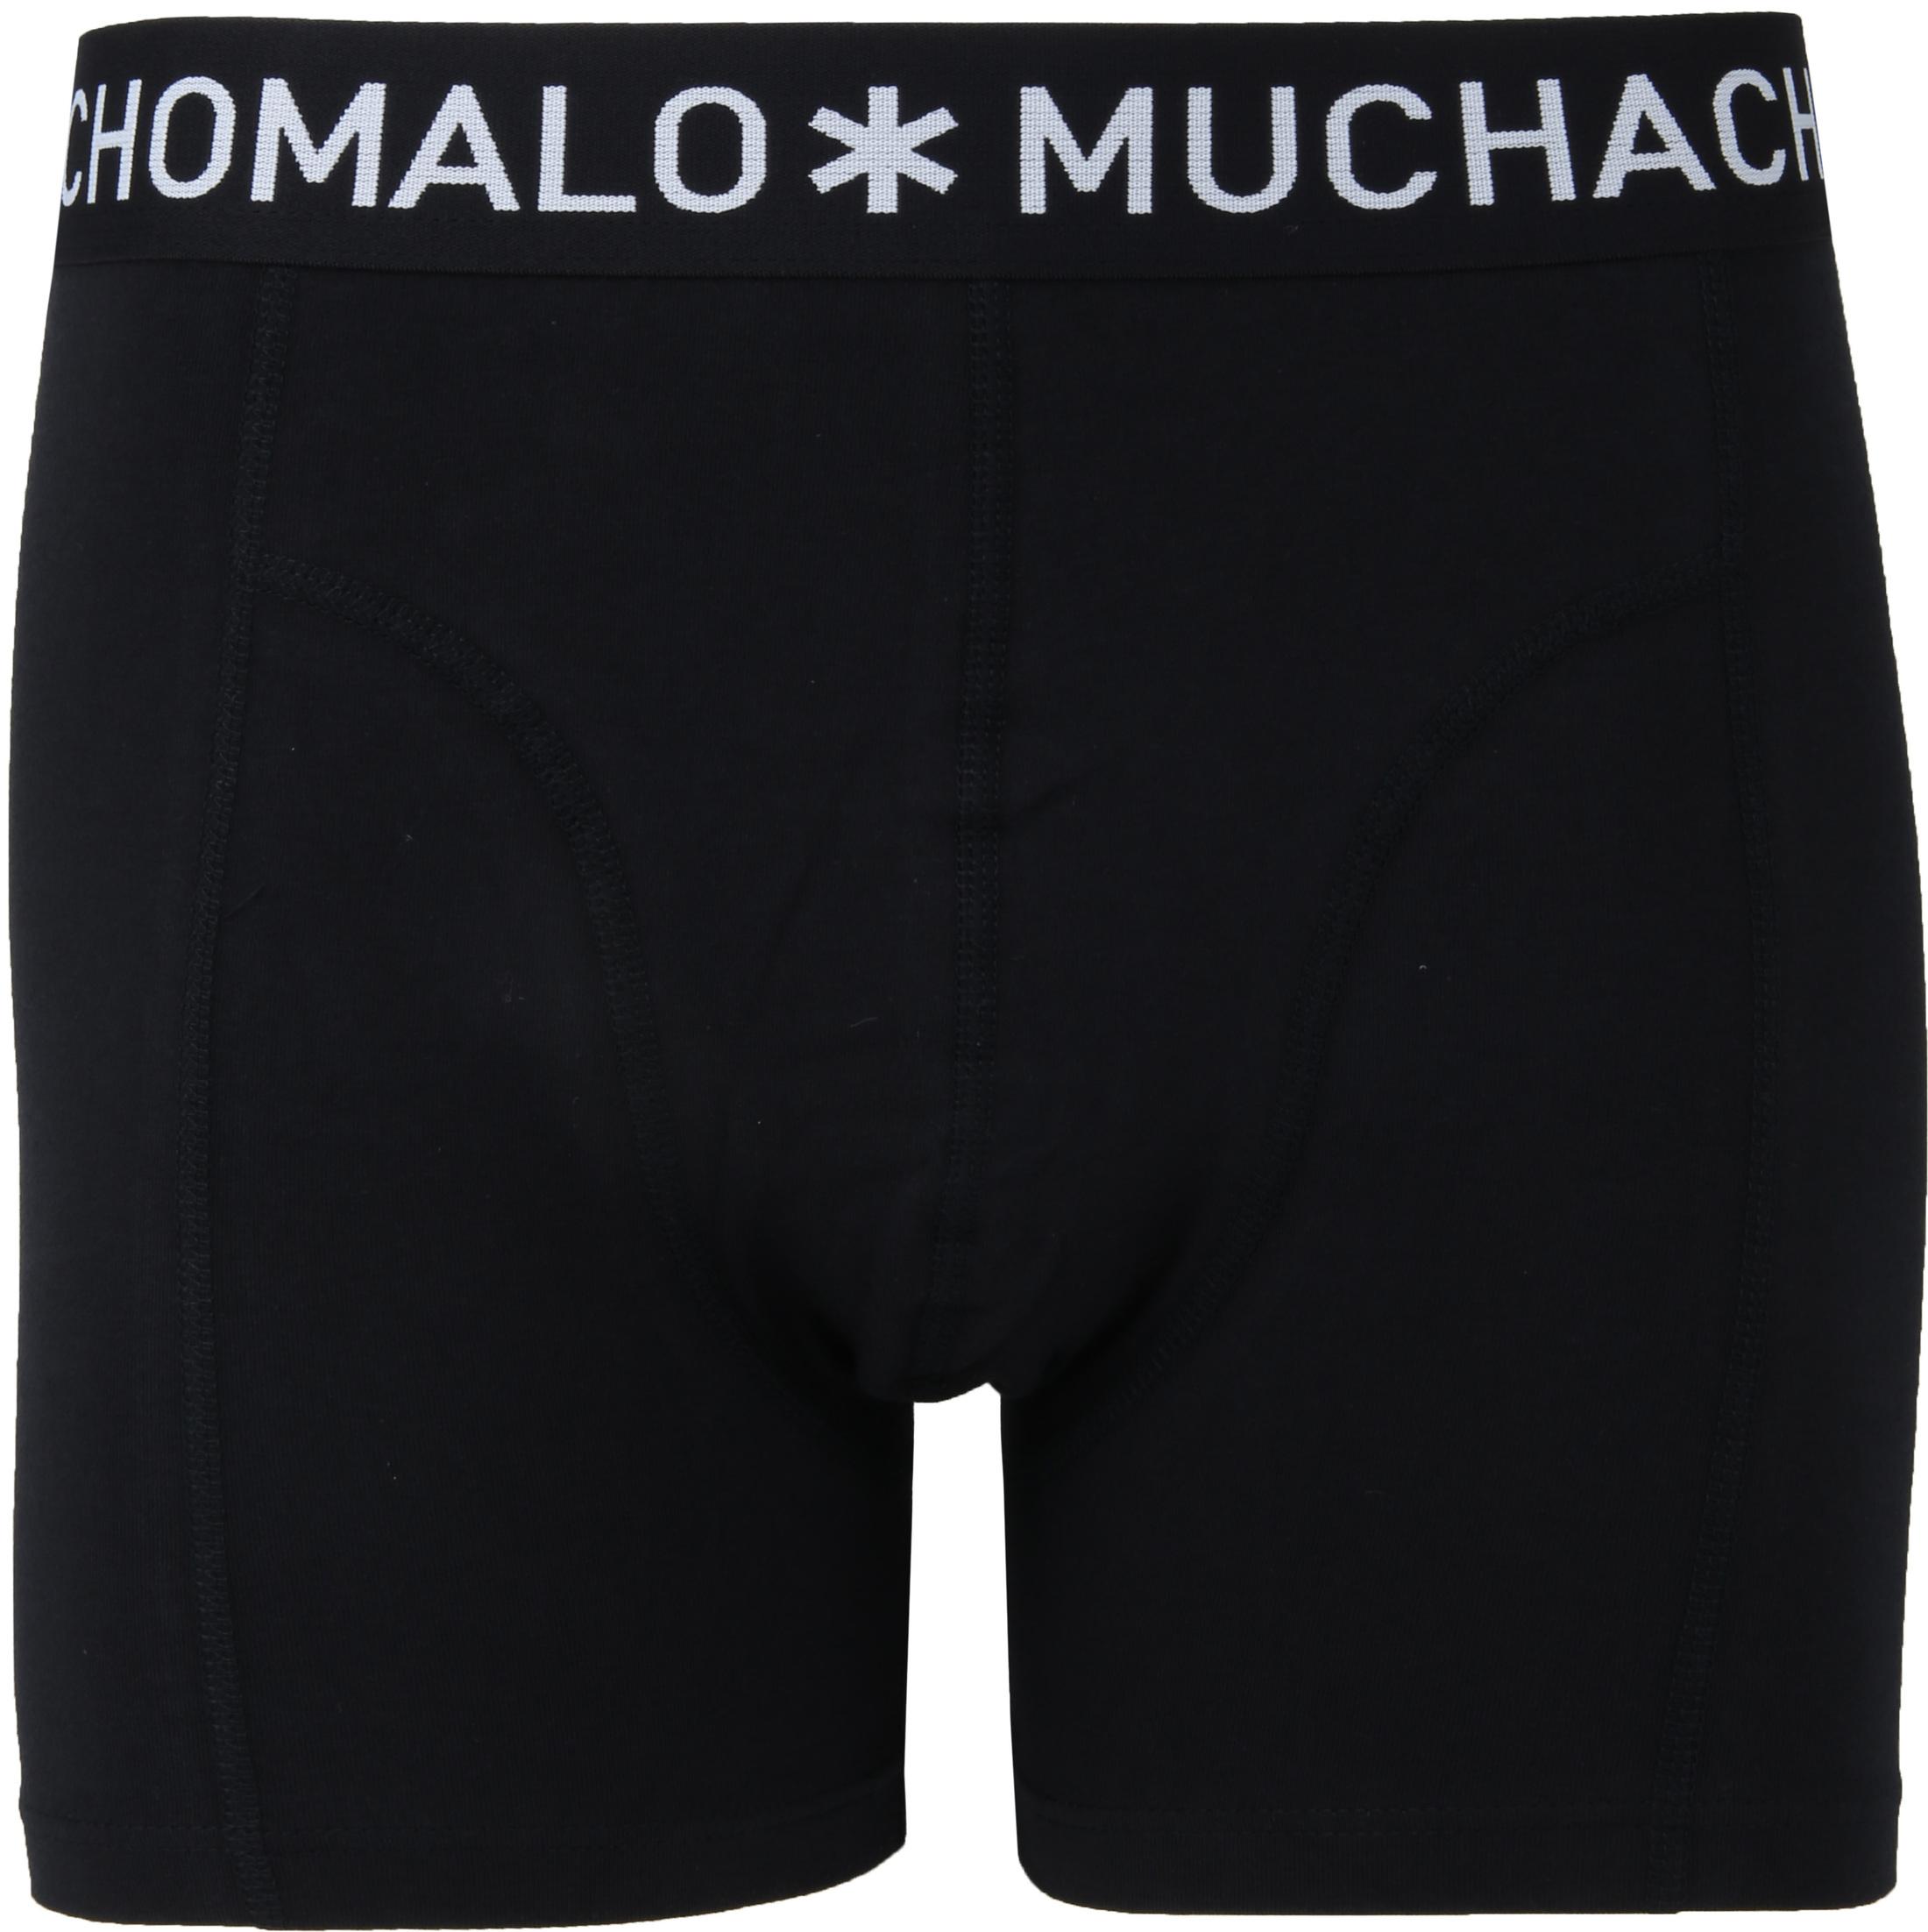 Muchachomalo Boxershorts 3er-Pack Schwarz 185 Foto 1